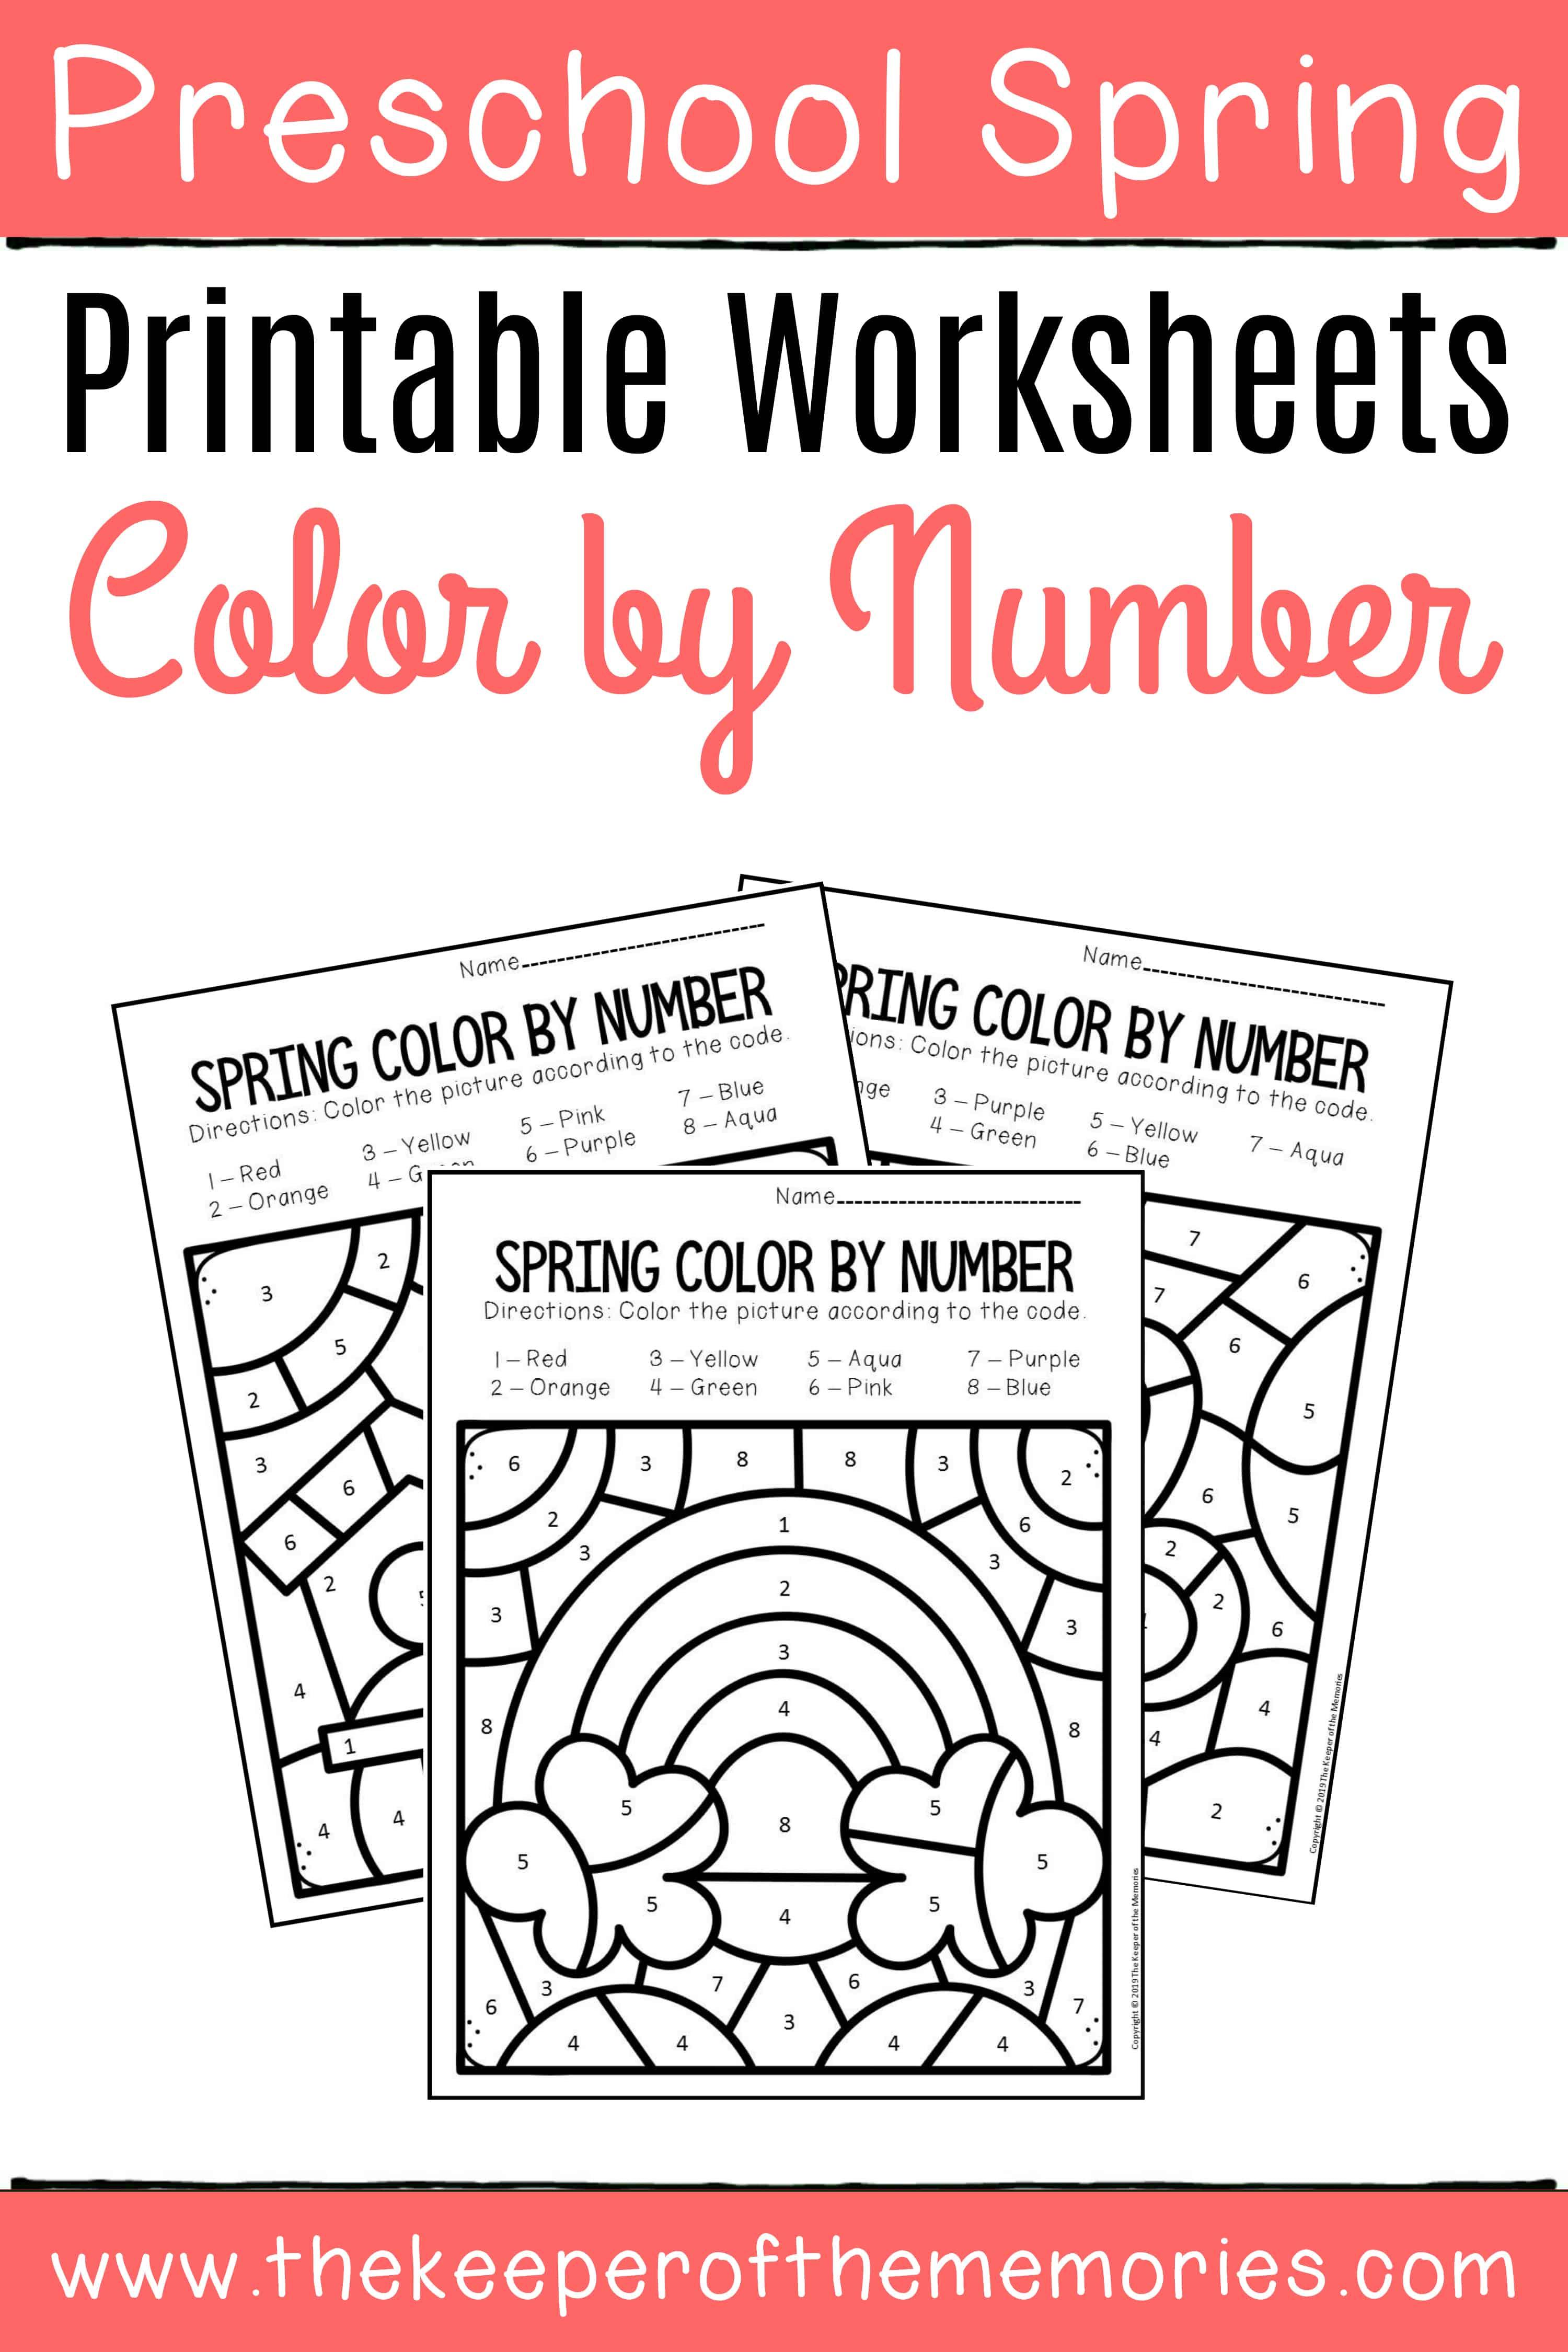 Color by Number Spring Preschool Worksheets